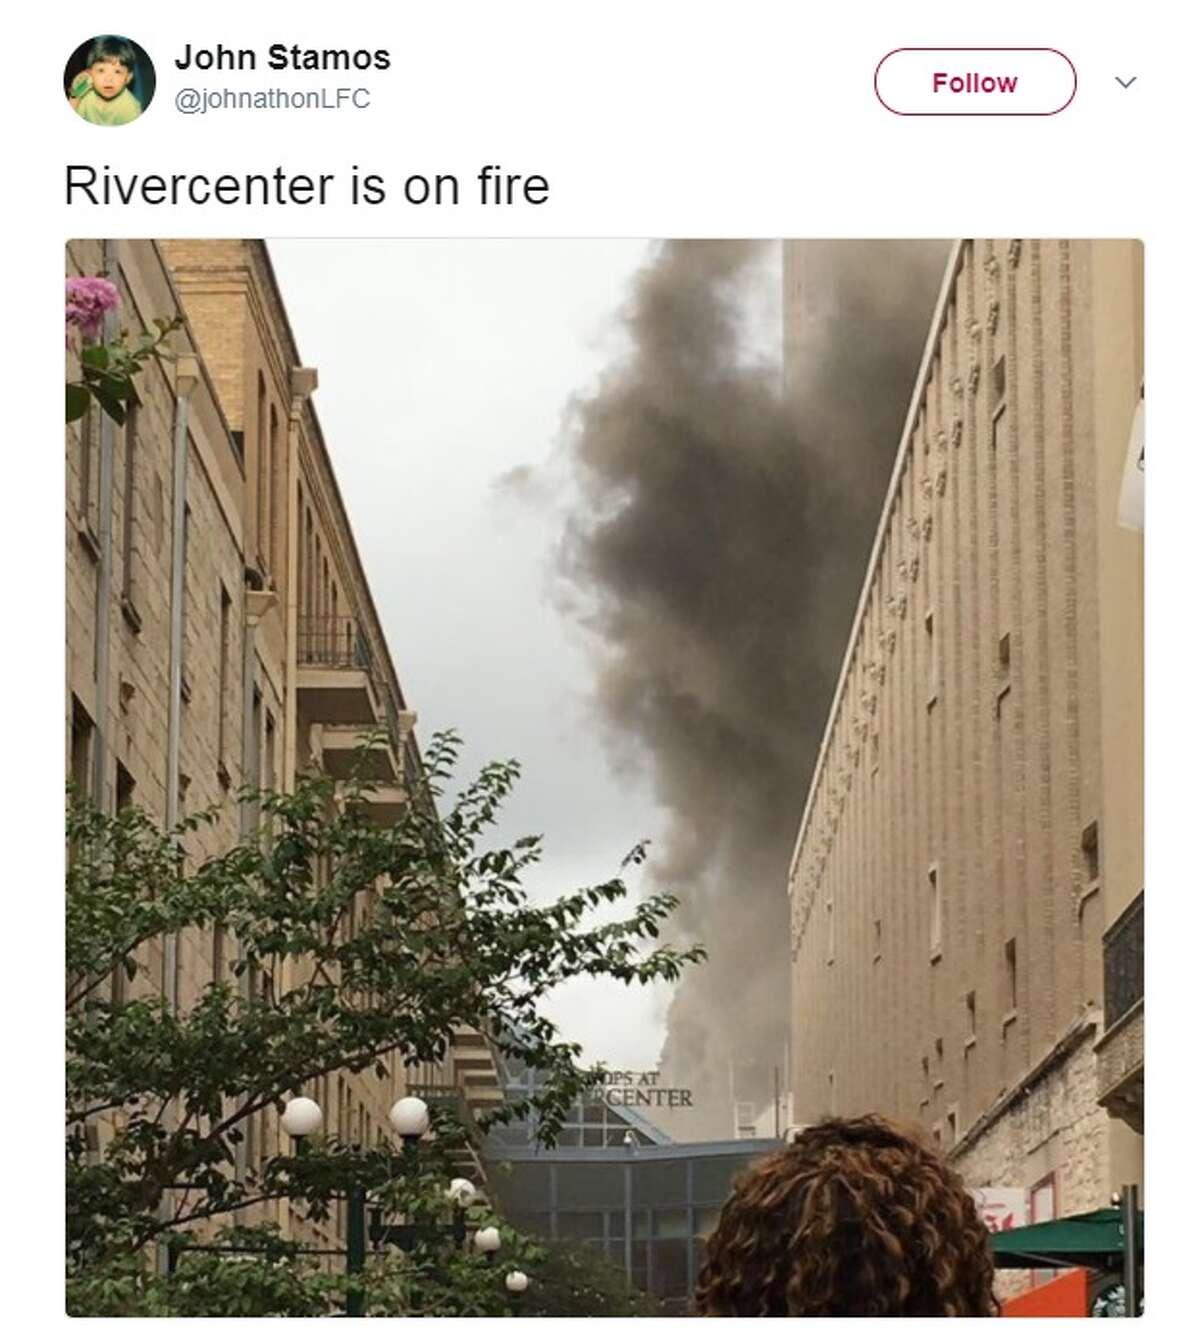 @jonathonLFC: Rivercenter is on fire